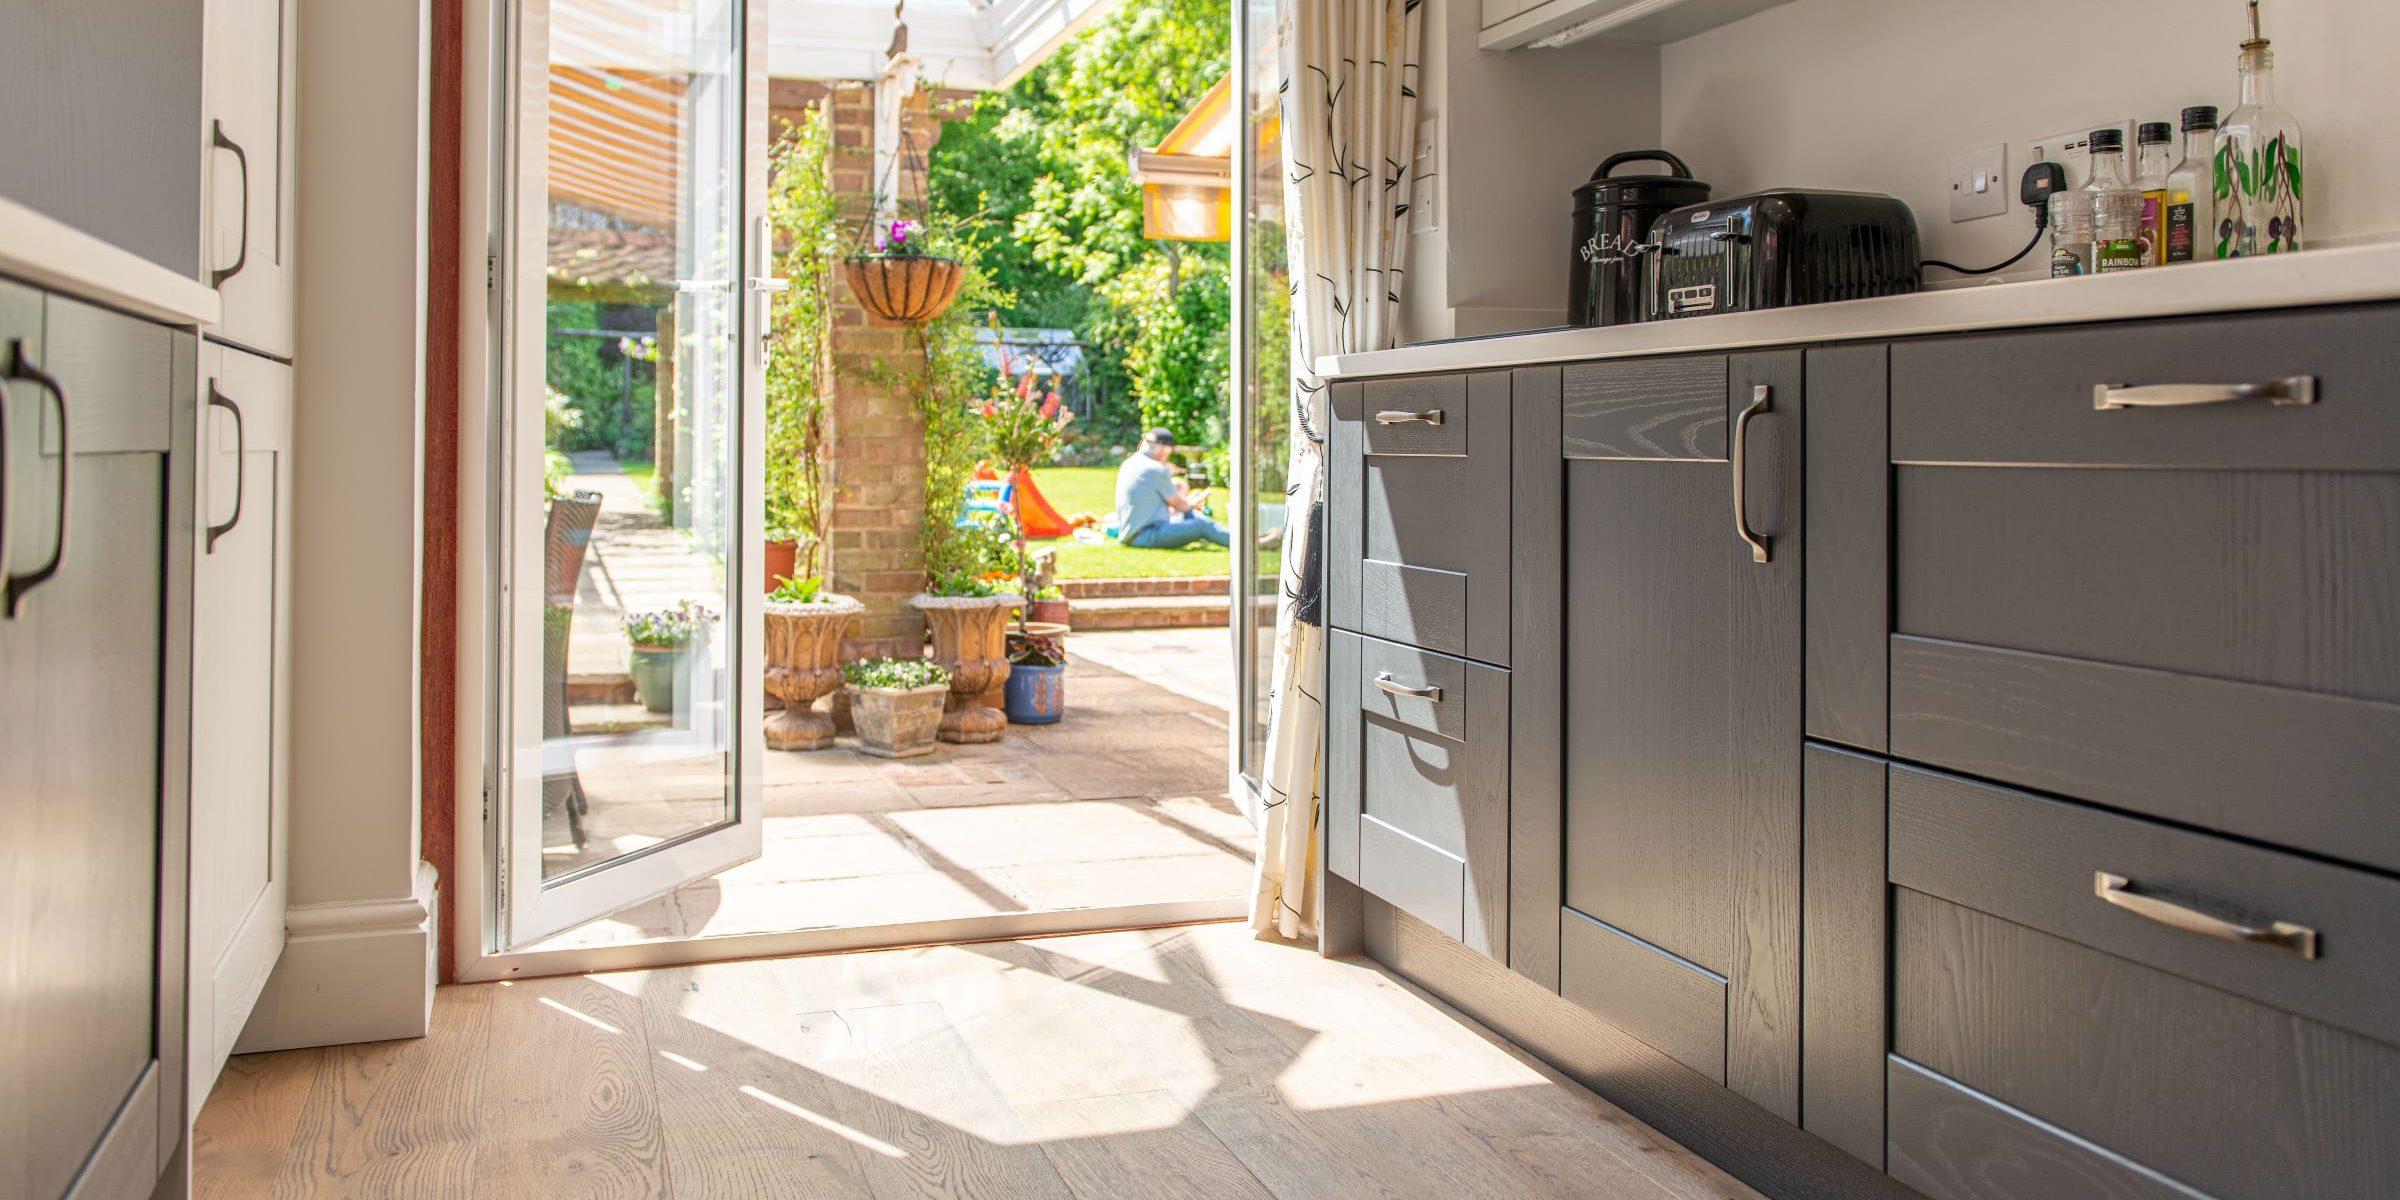 Deco frozen umber knaphill kitchen 10